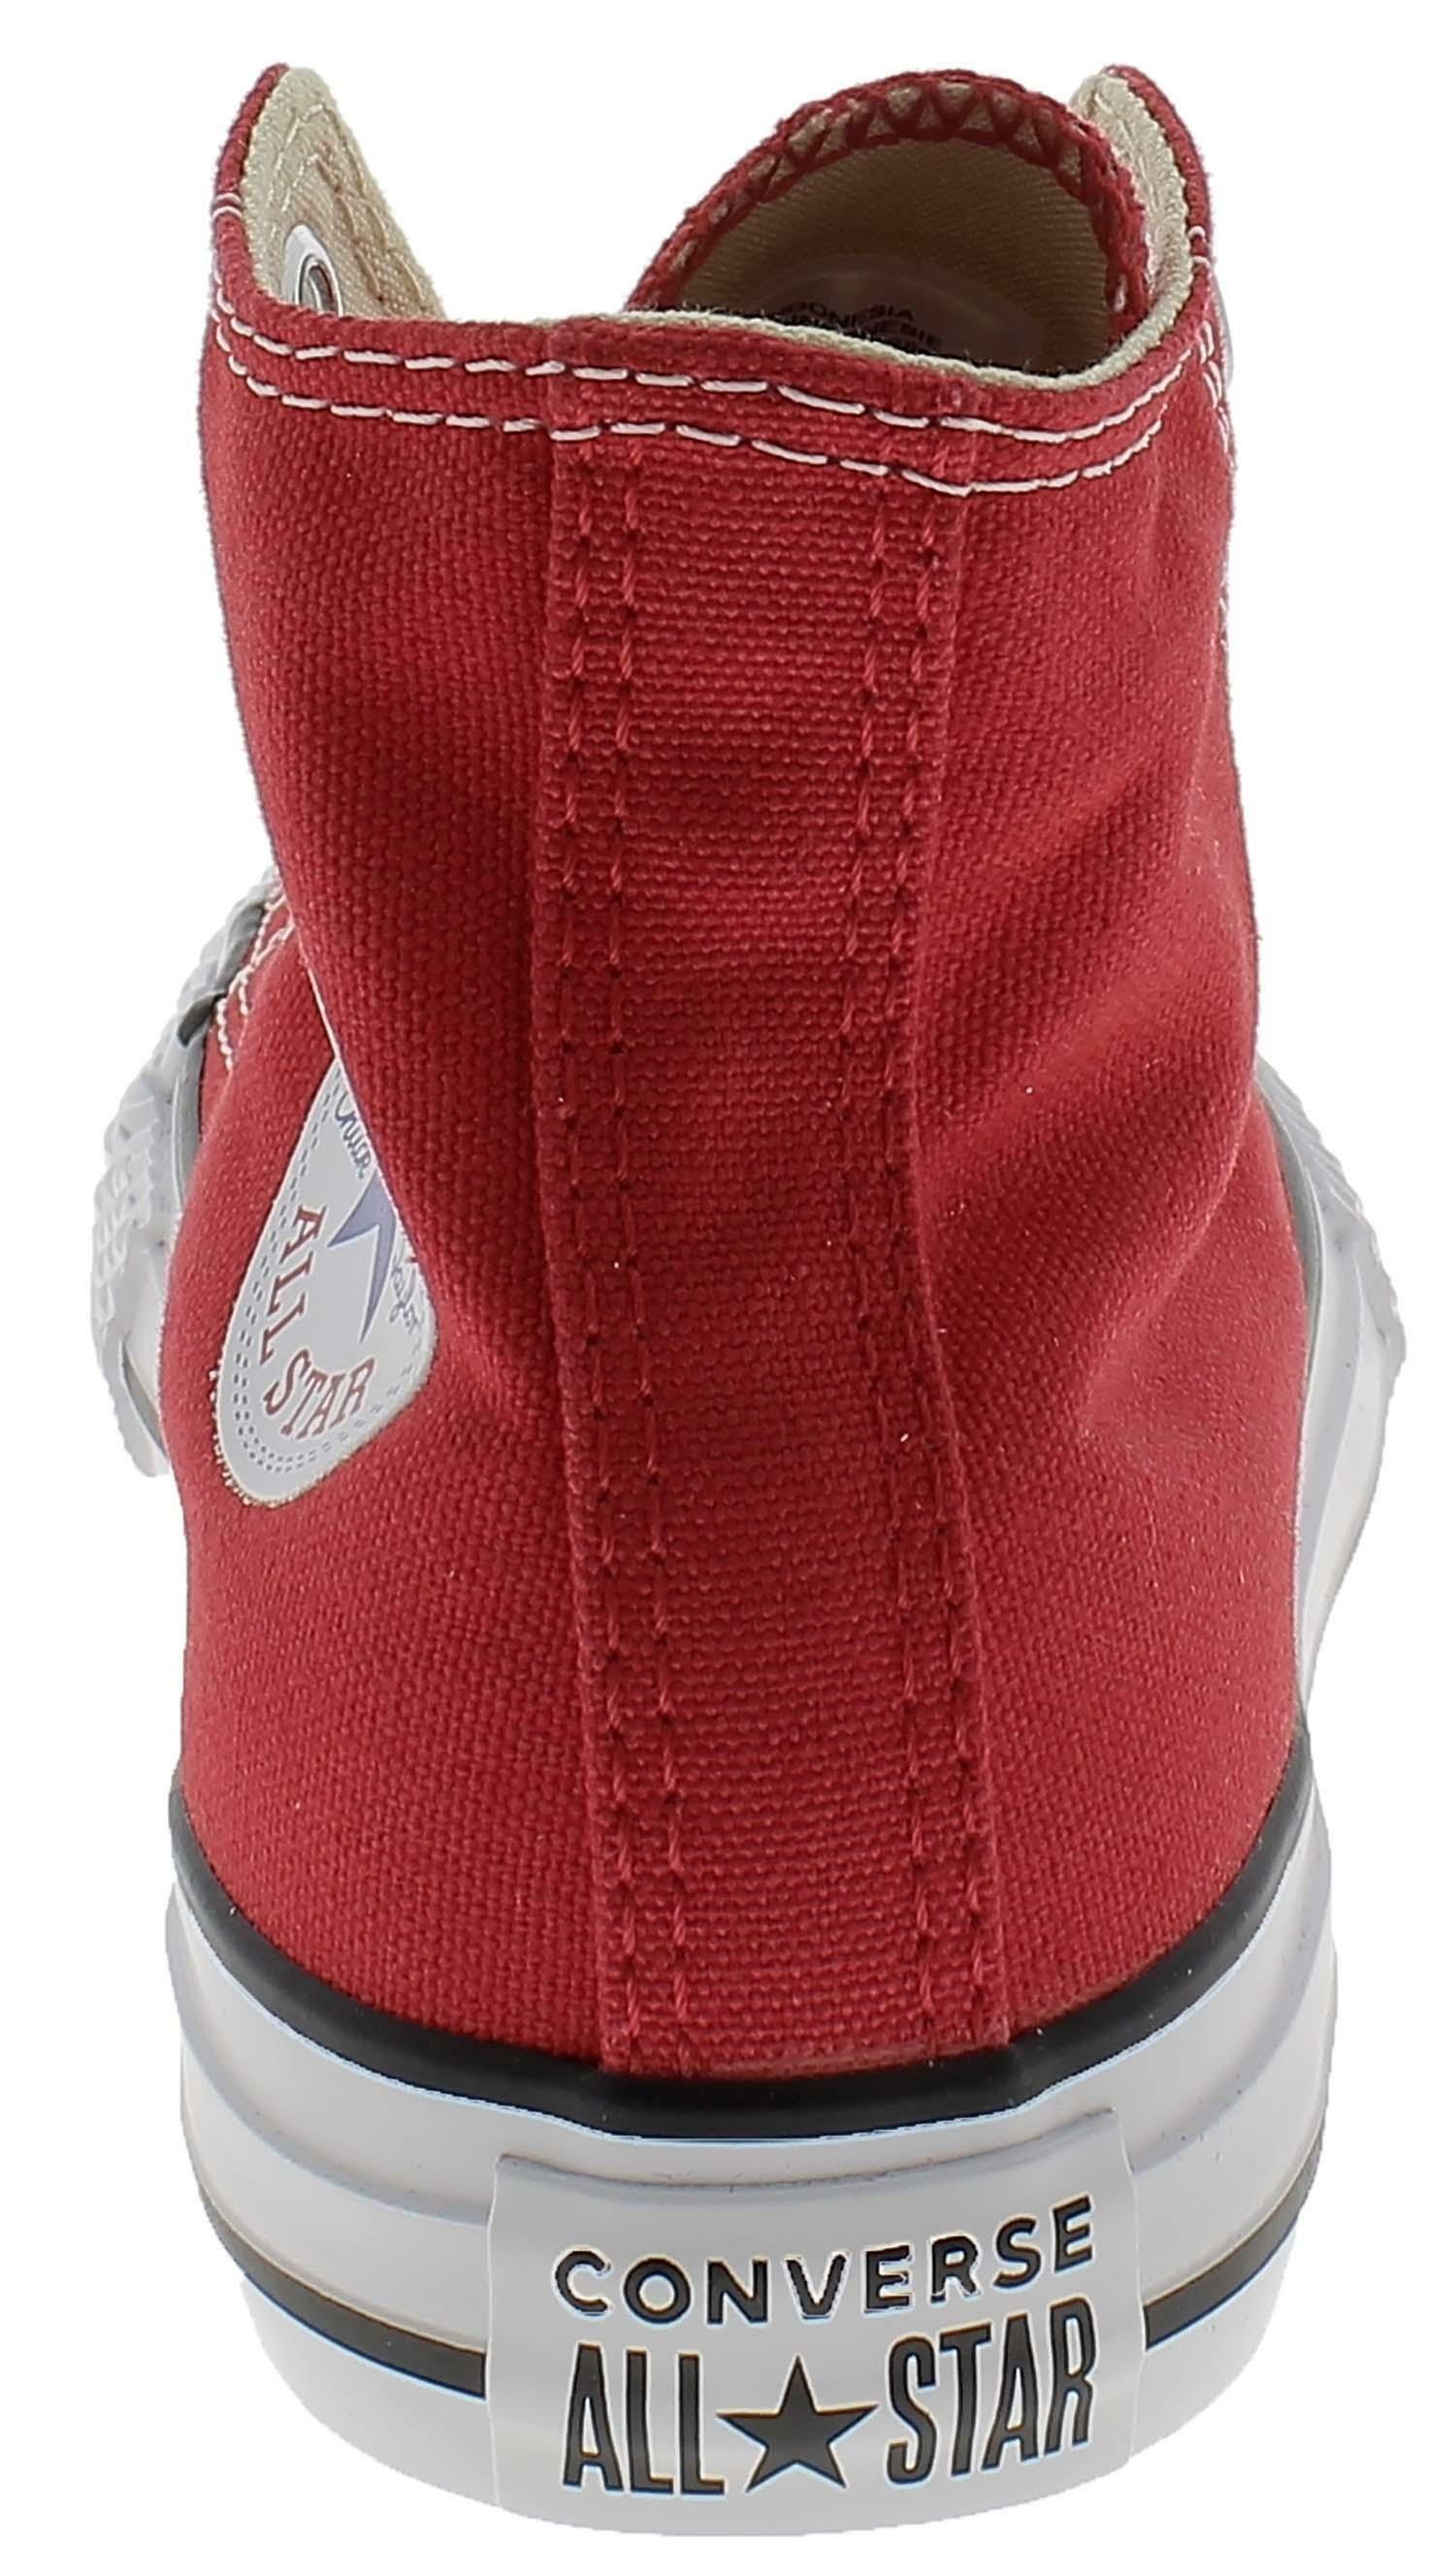 converse converse all star ct scarpe sneakers alte hi rosse red bambino 3j232c